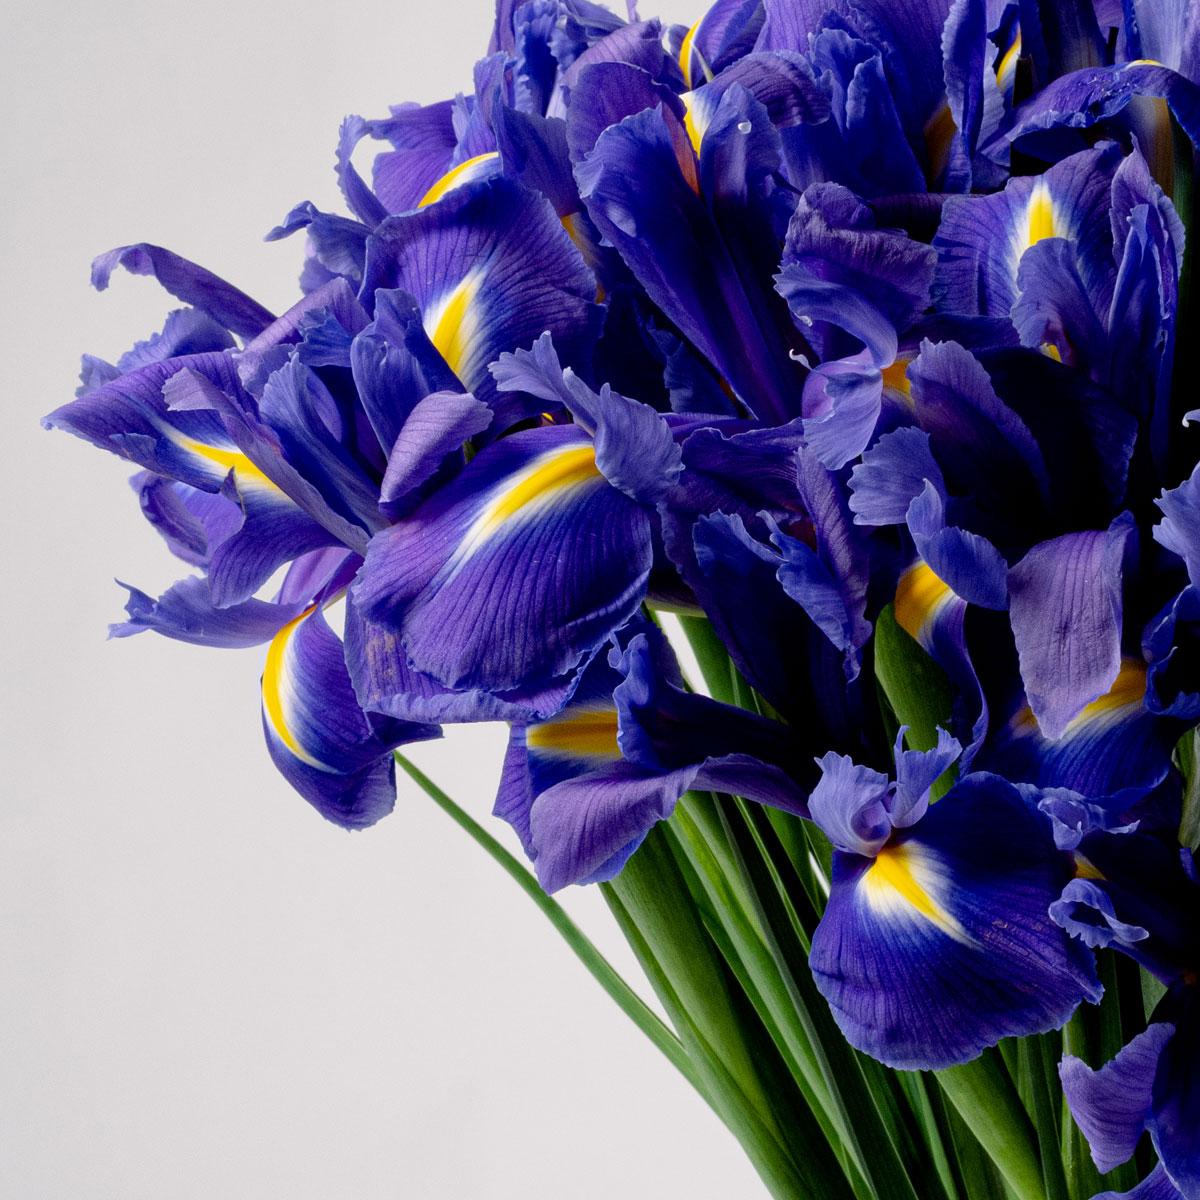 Bloom Flower Delivery | Amethyst Purple Iris